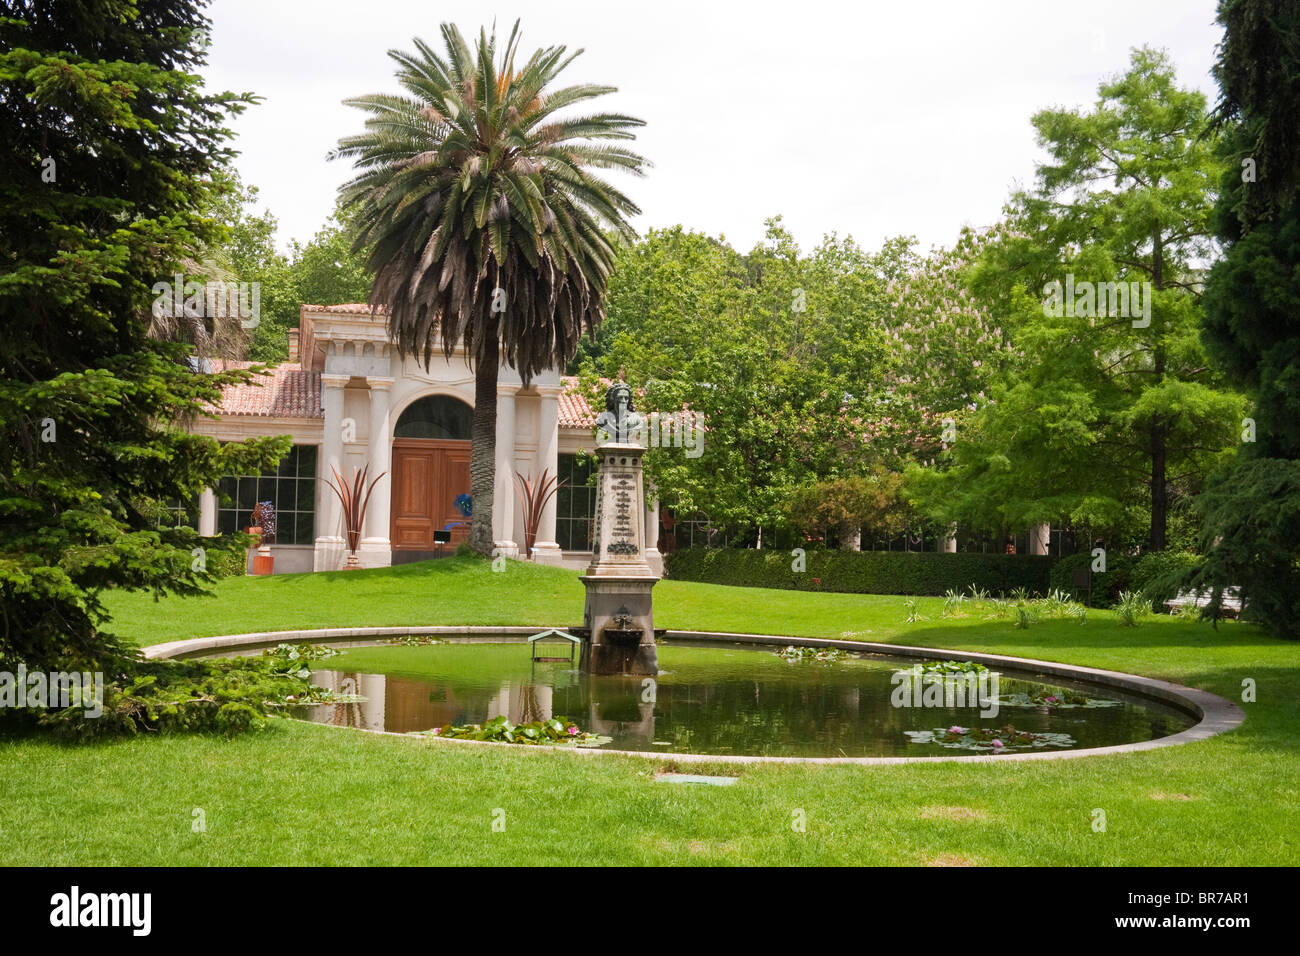 Real Jardín Botánico, The Royal Botanic Gardens, Madrid, Spain. The  Villanueva Pavilion Is In The Background